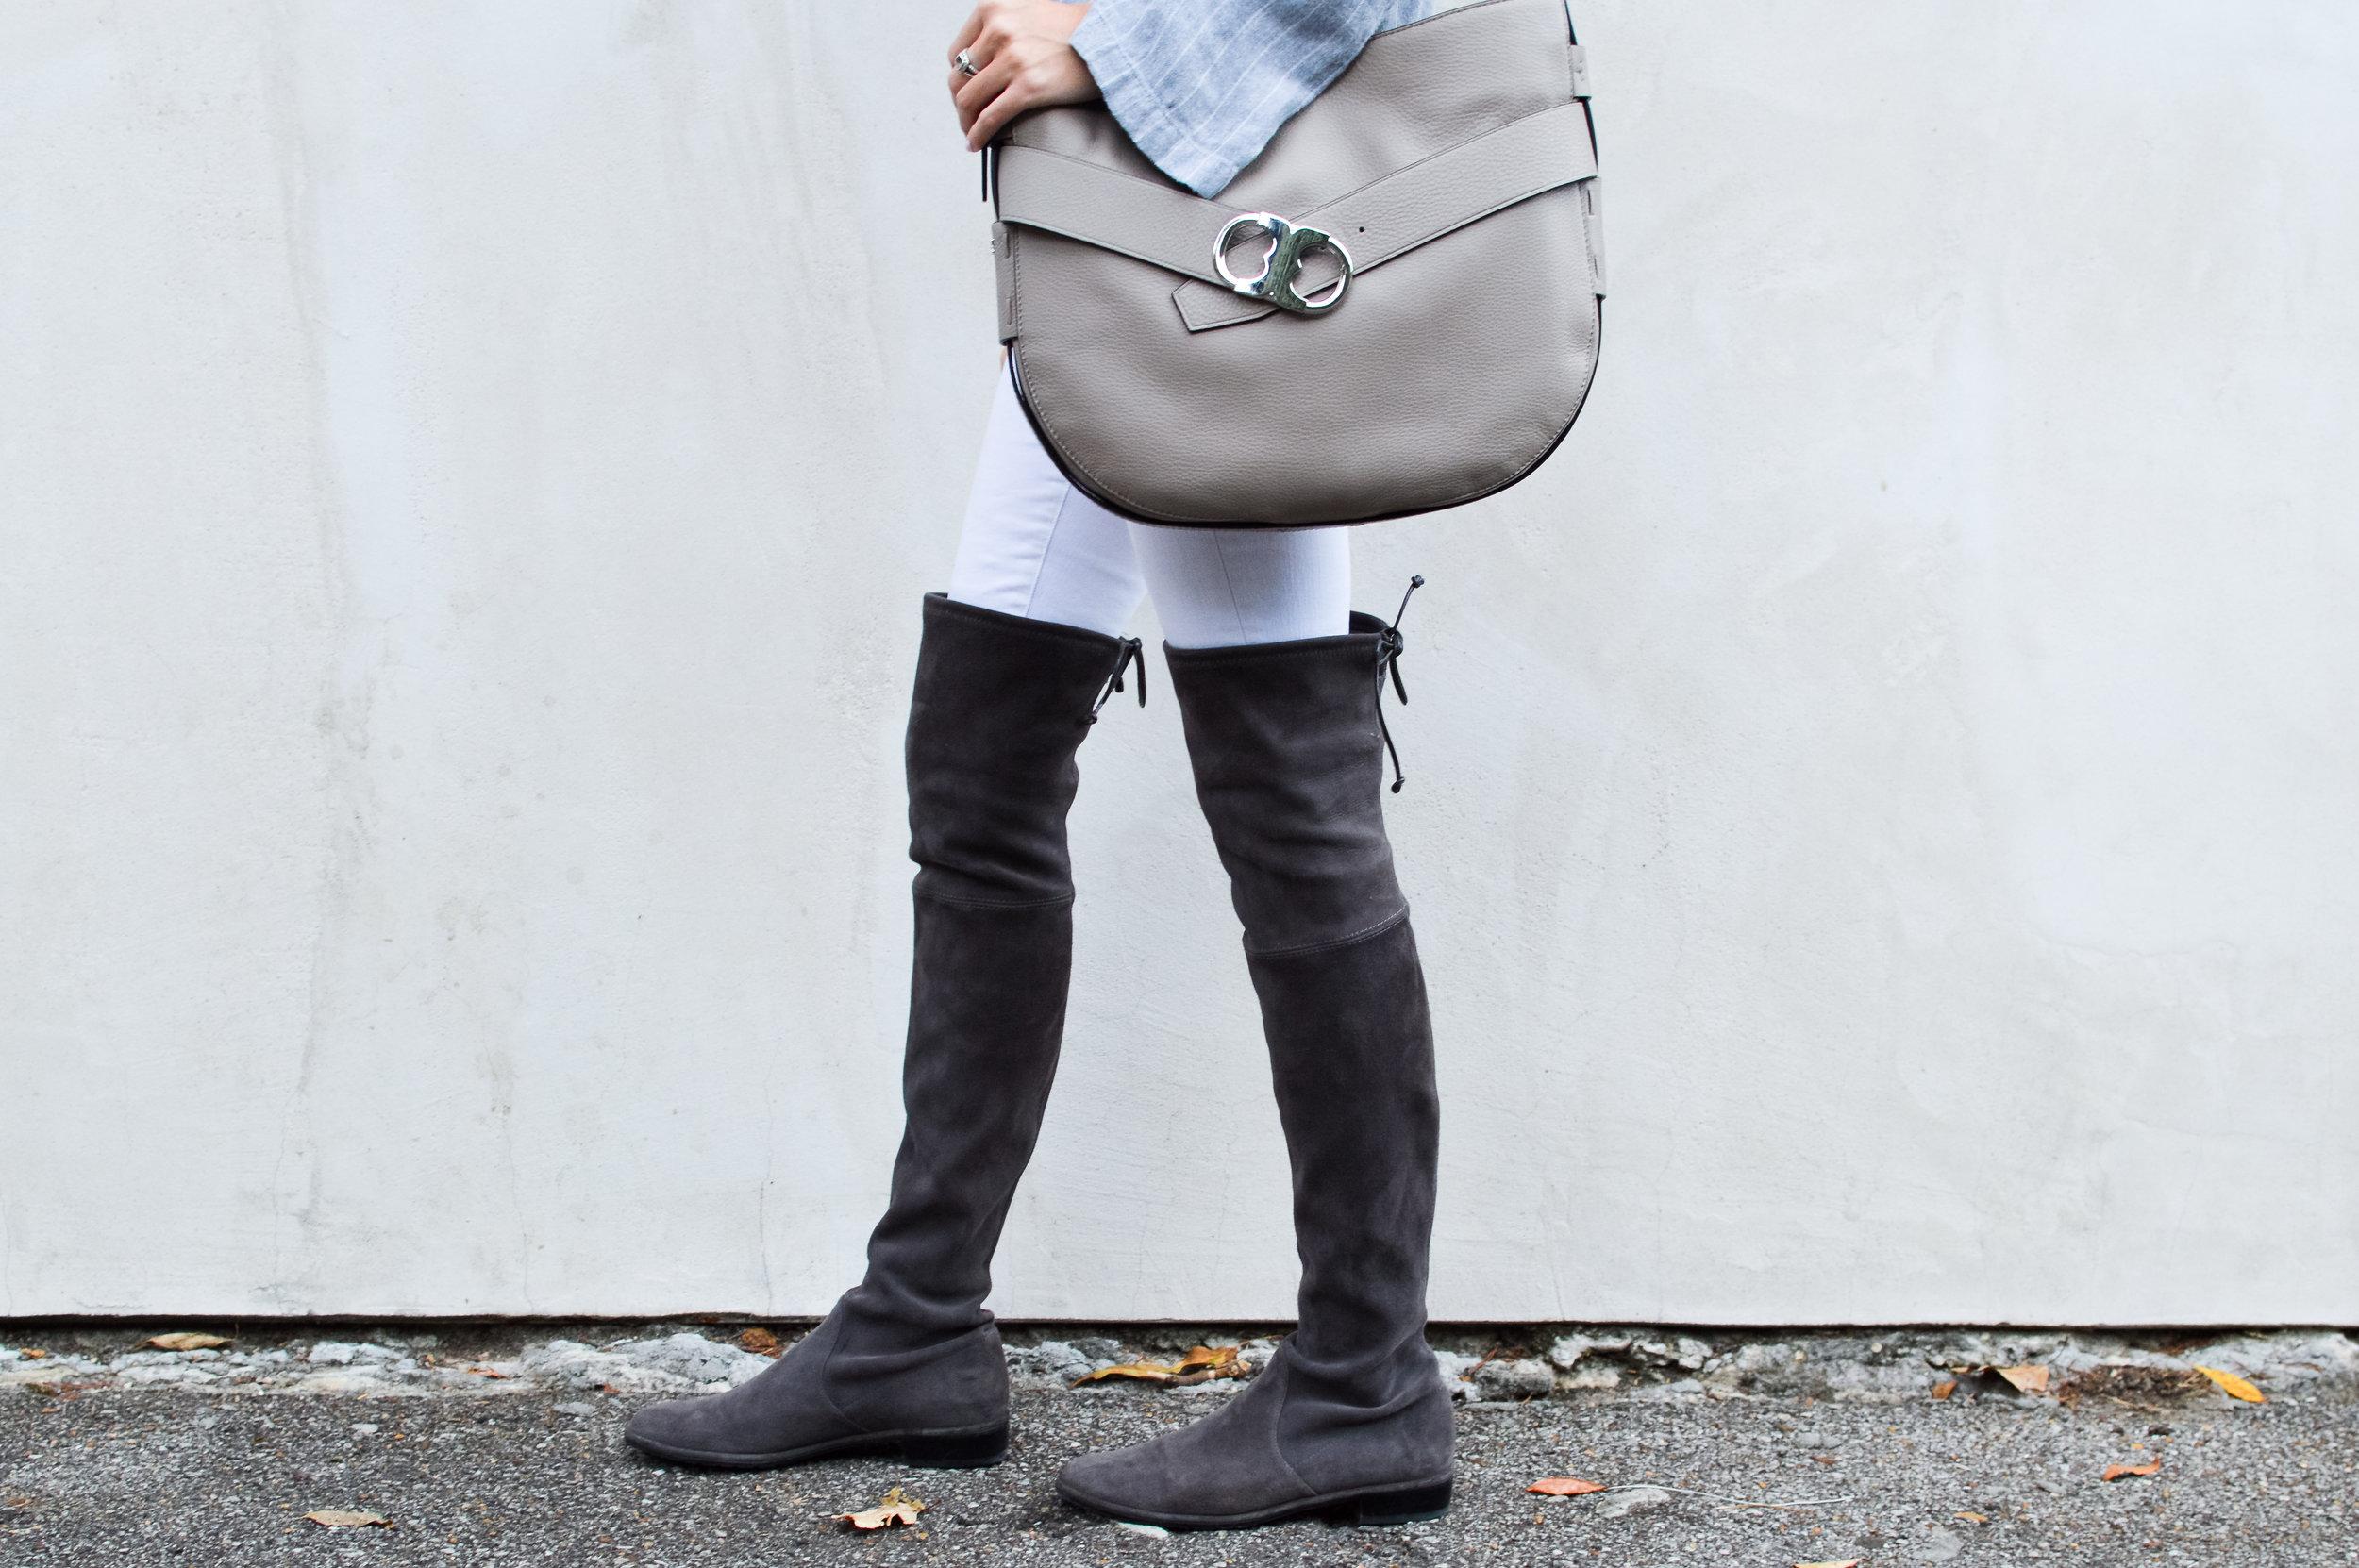 fashion blogger lcb style stuart weitzman tory burch over the knee fall fashion (23 of 29).jpg